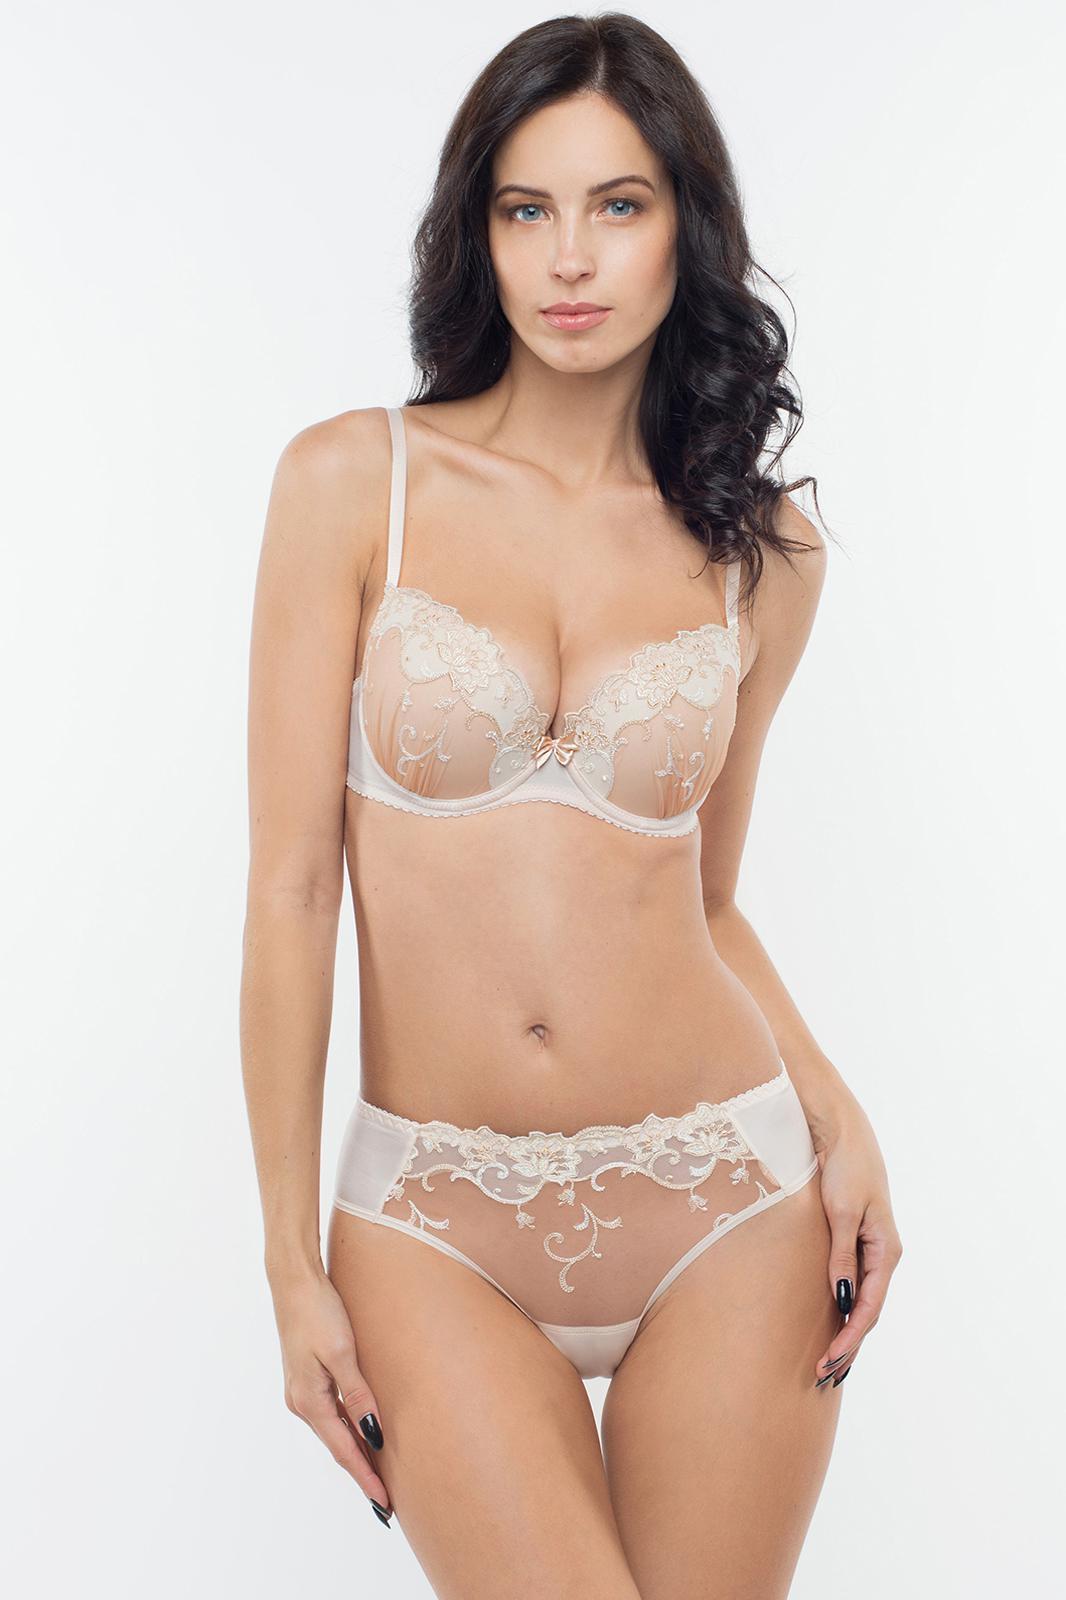 2b9124e85bad6 Бюстгальтер Milady lingerie, жасмин (модель 101.8.4) — Белорусский ...